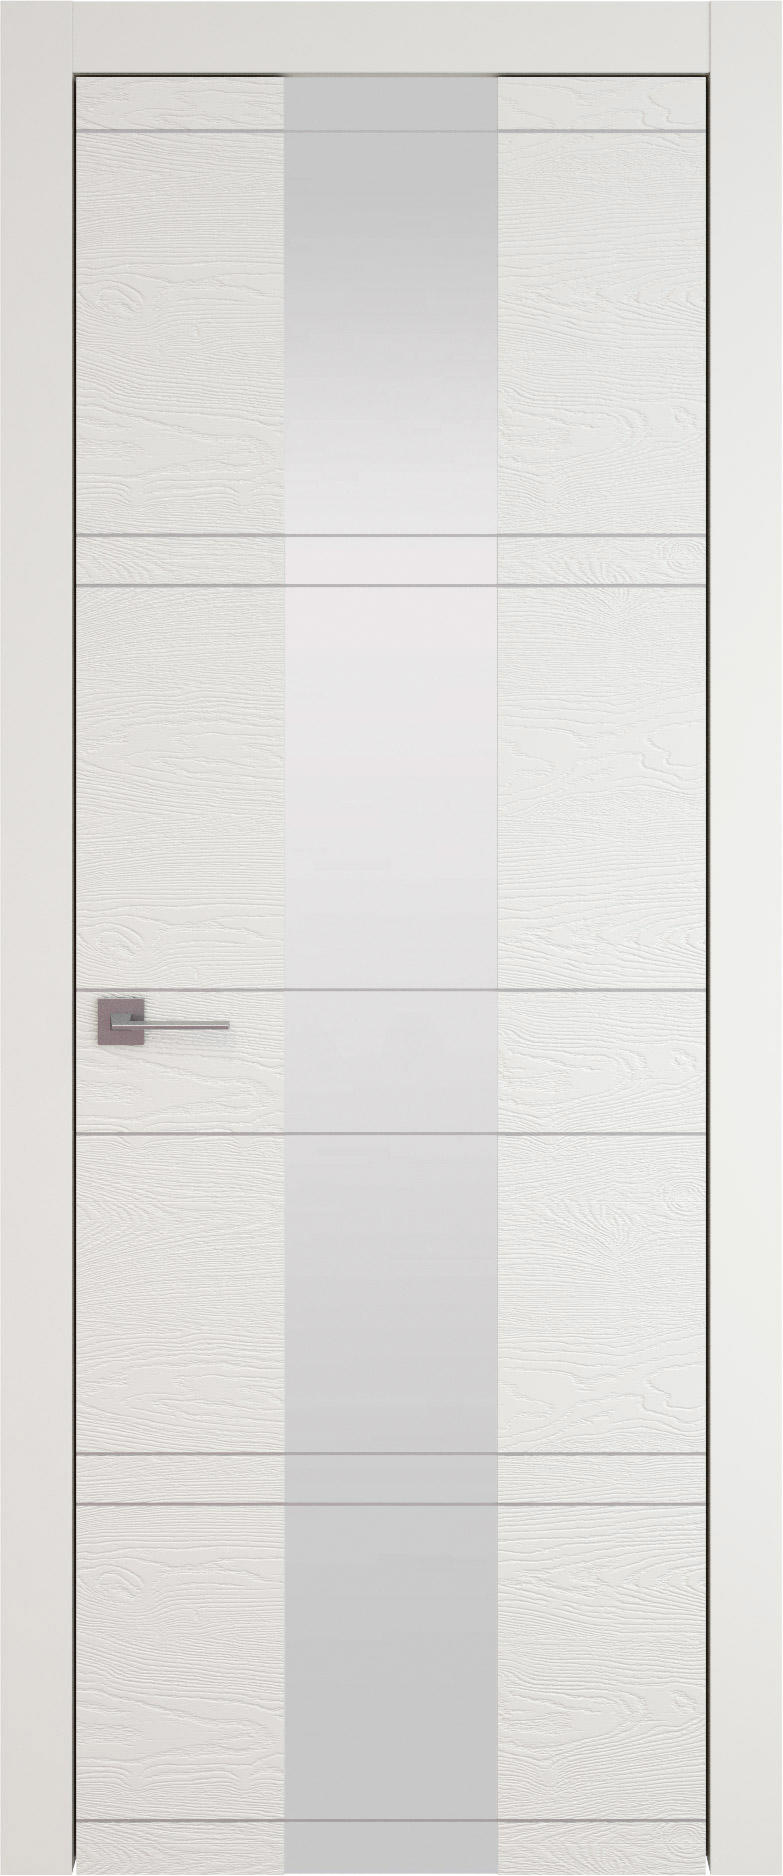 Tivoli Ж-2 цвет - Бежевая эмаль по шпону (RAL 9010) Со стеклом (ДО)